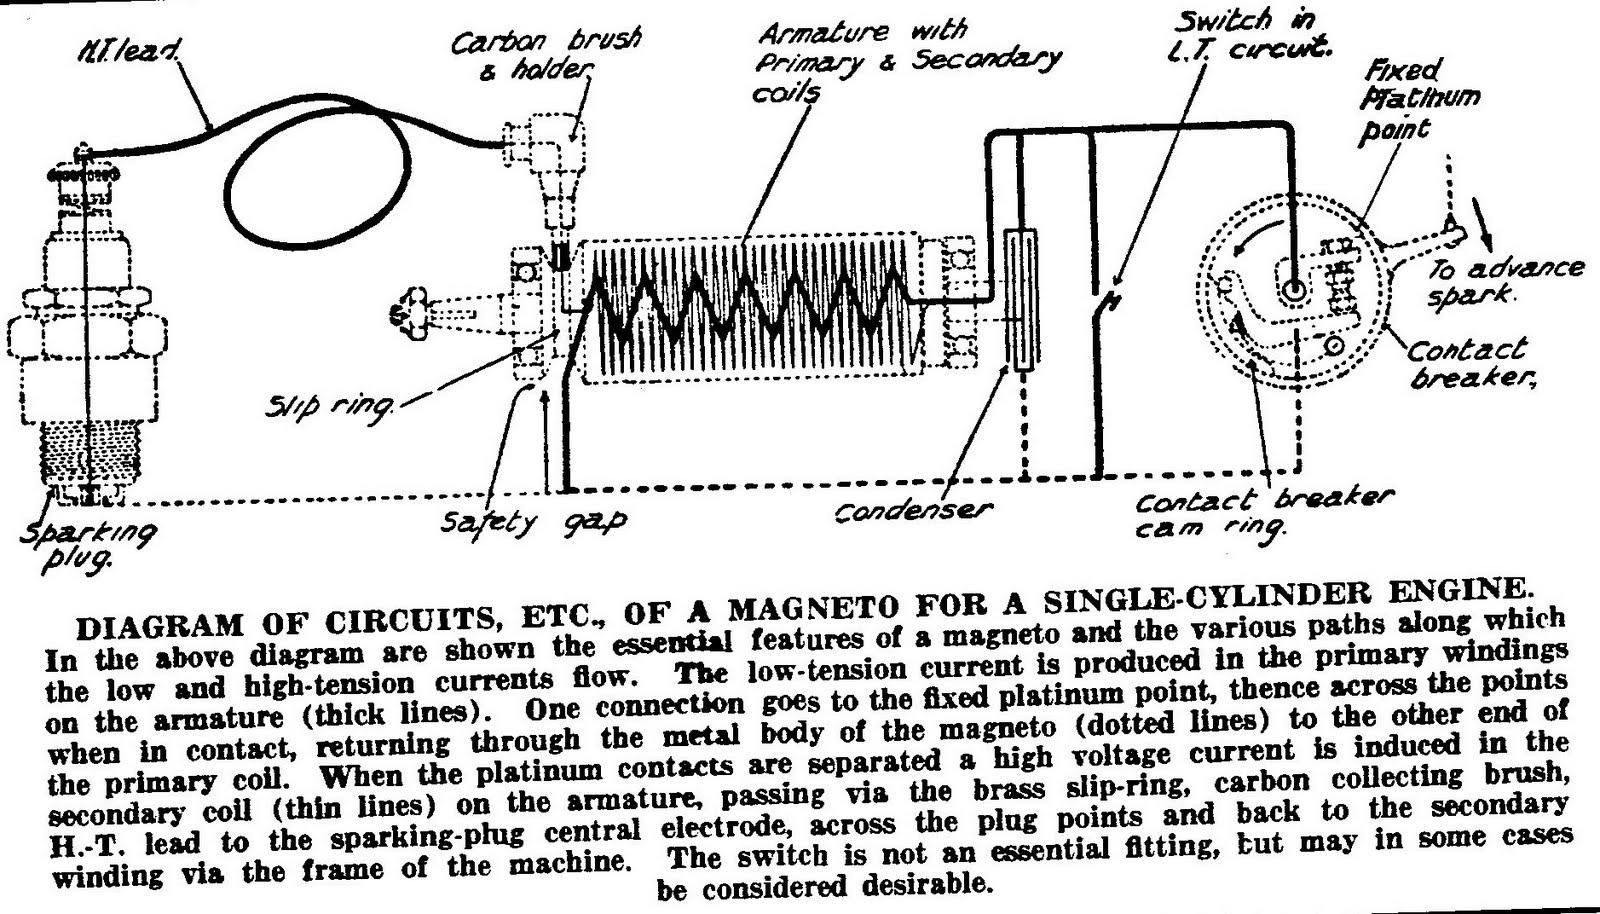 magneto wiring 25cc schematic wiring library john deere wiring schematic magneto wiring 25cc schematic [ 1600 x 914 Pixel ]